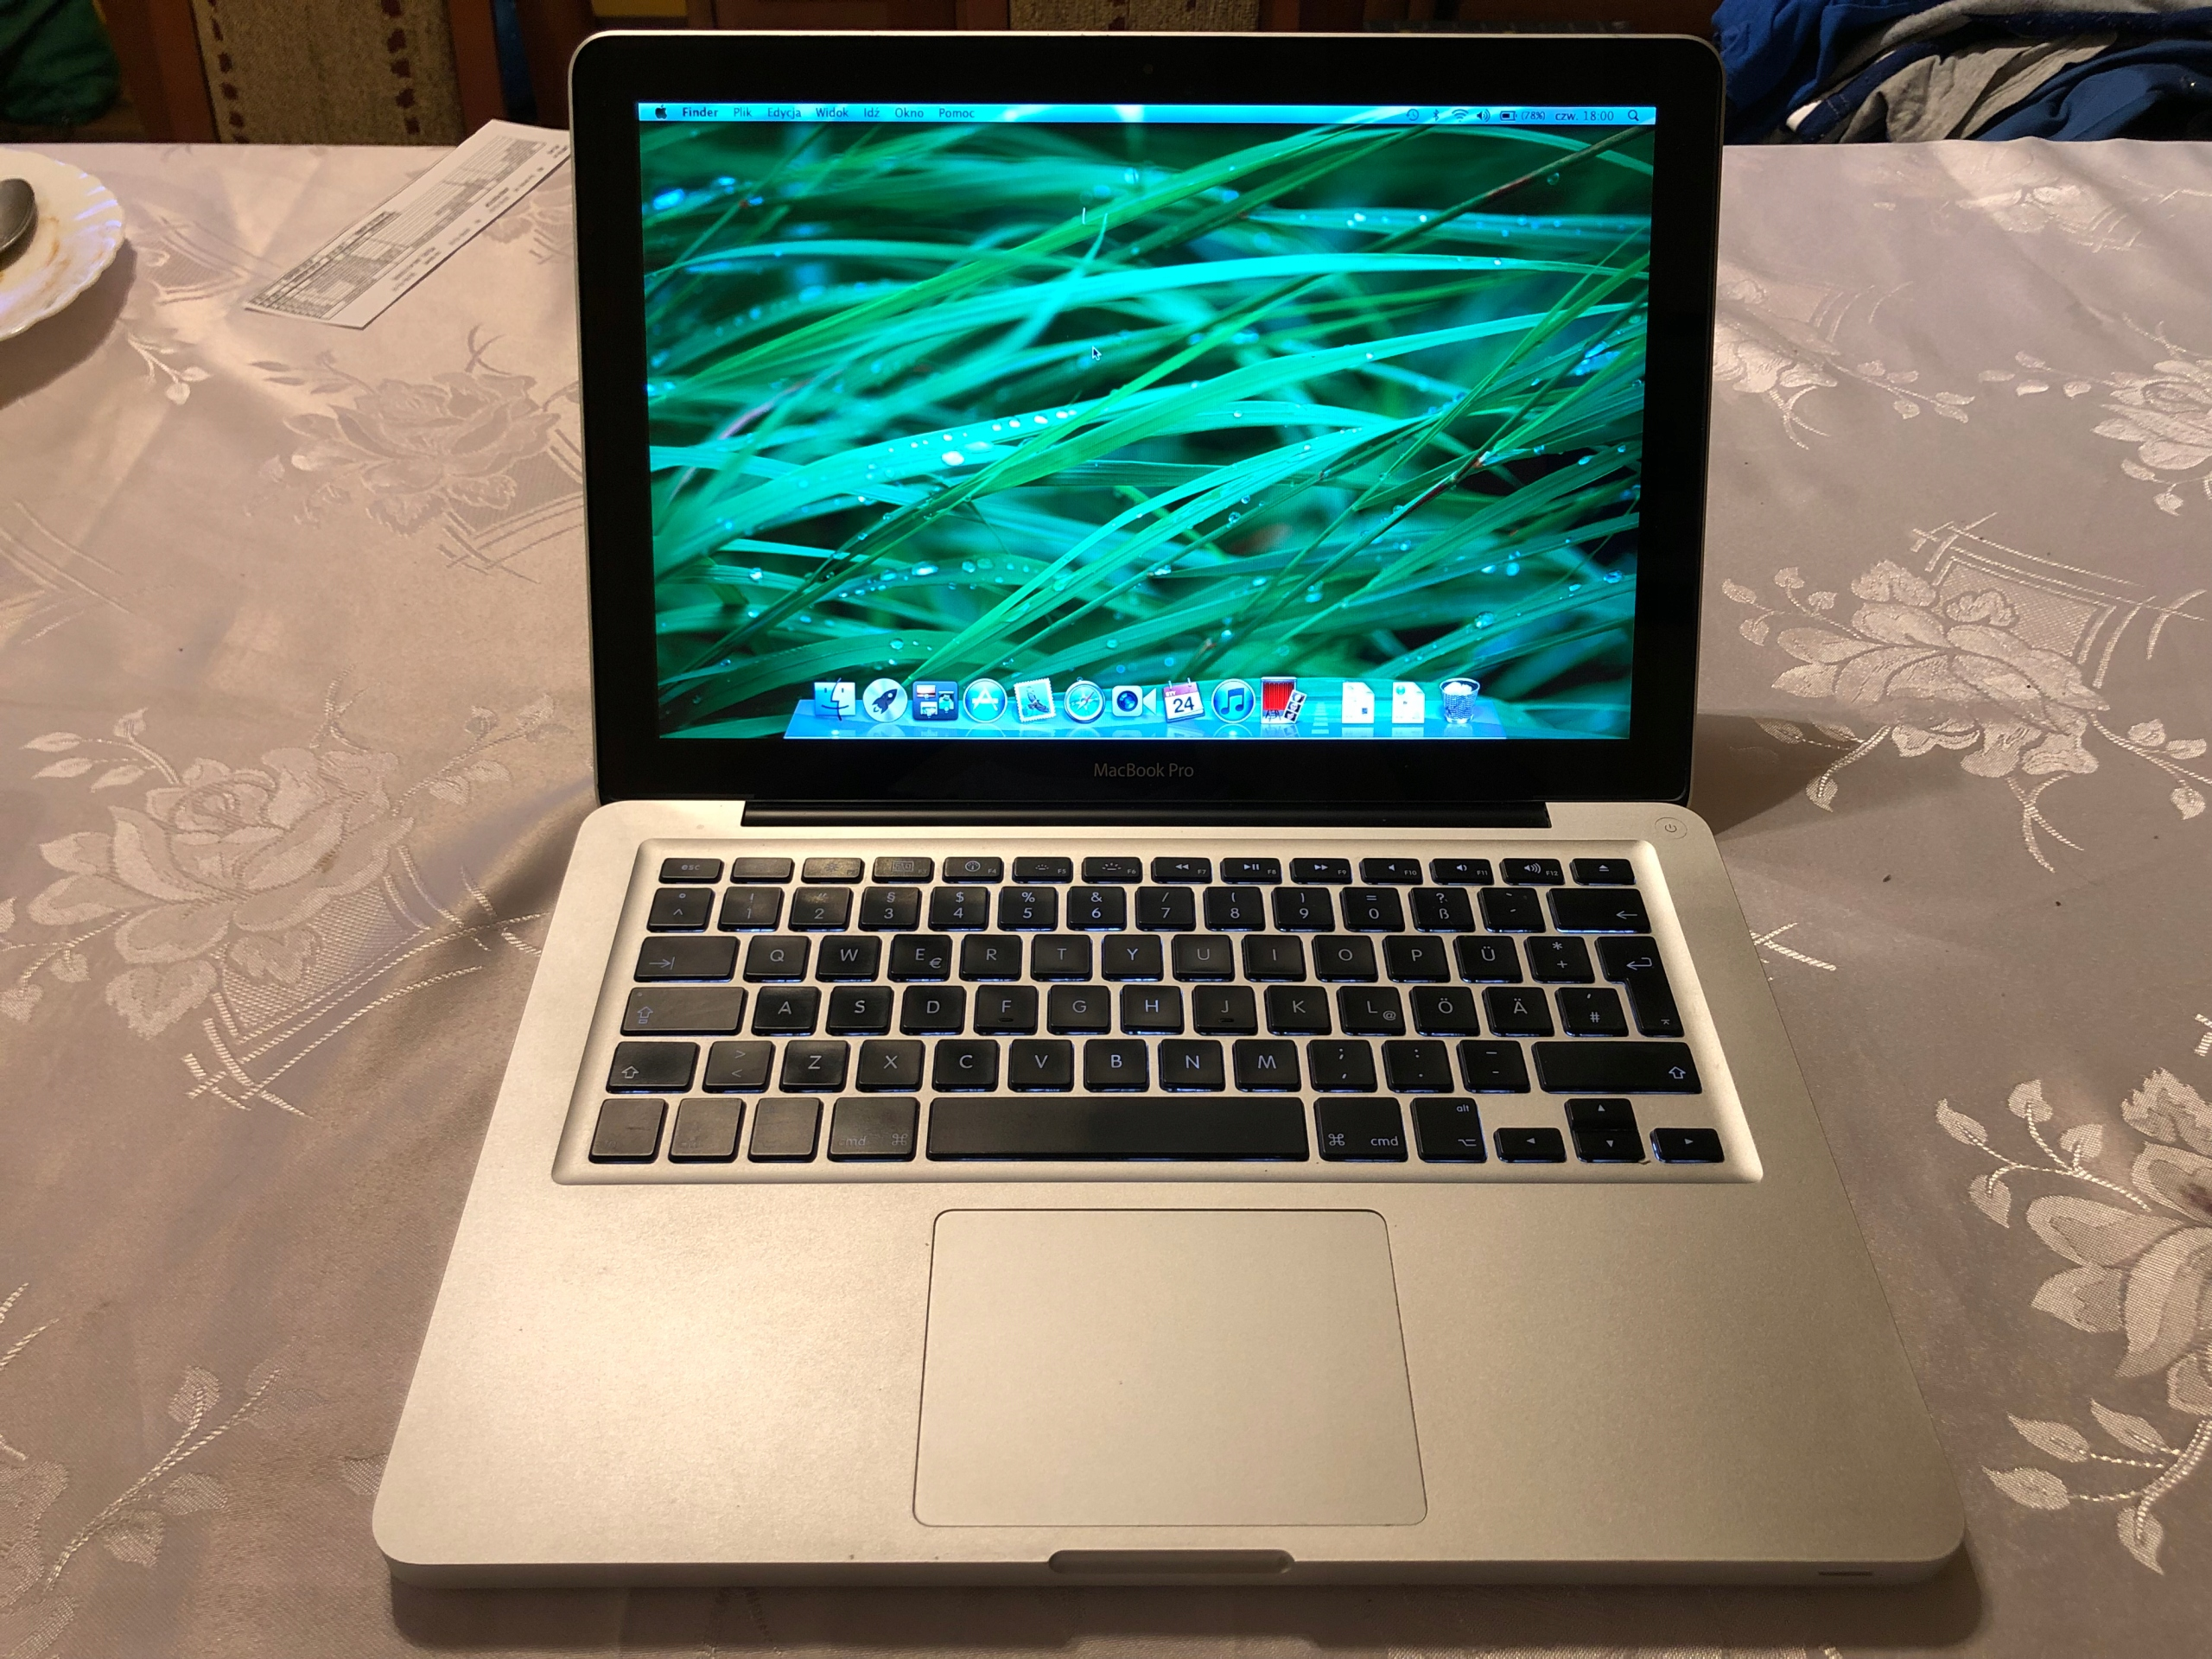 Macbook Pro 13 Intel Core 2 Duo 2,25 GHz 5GB RAM